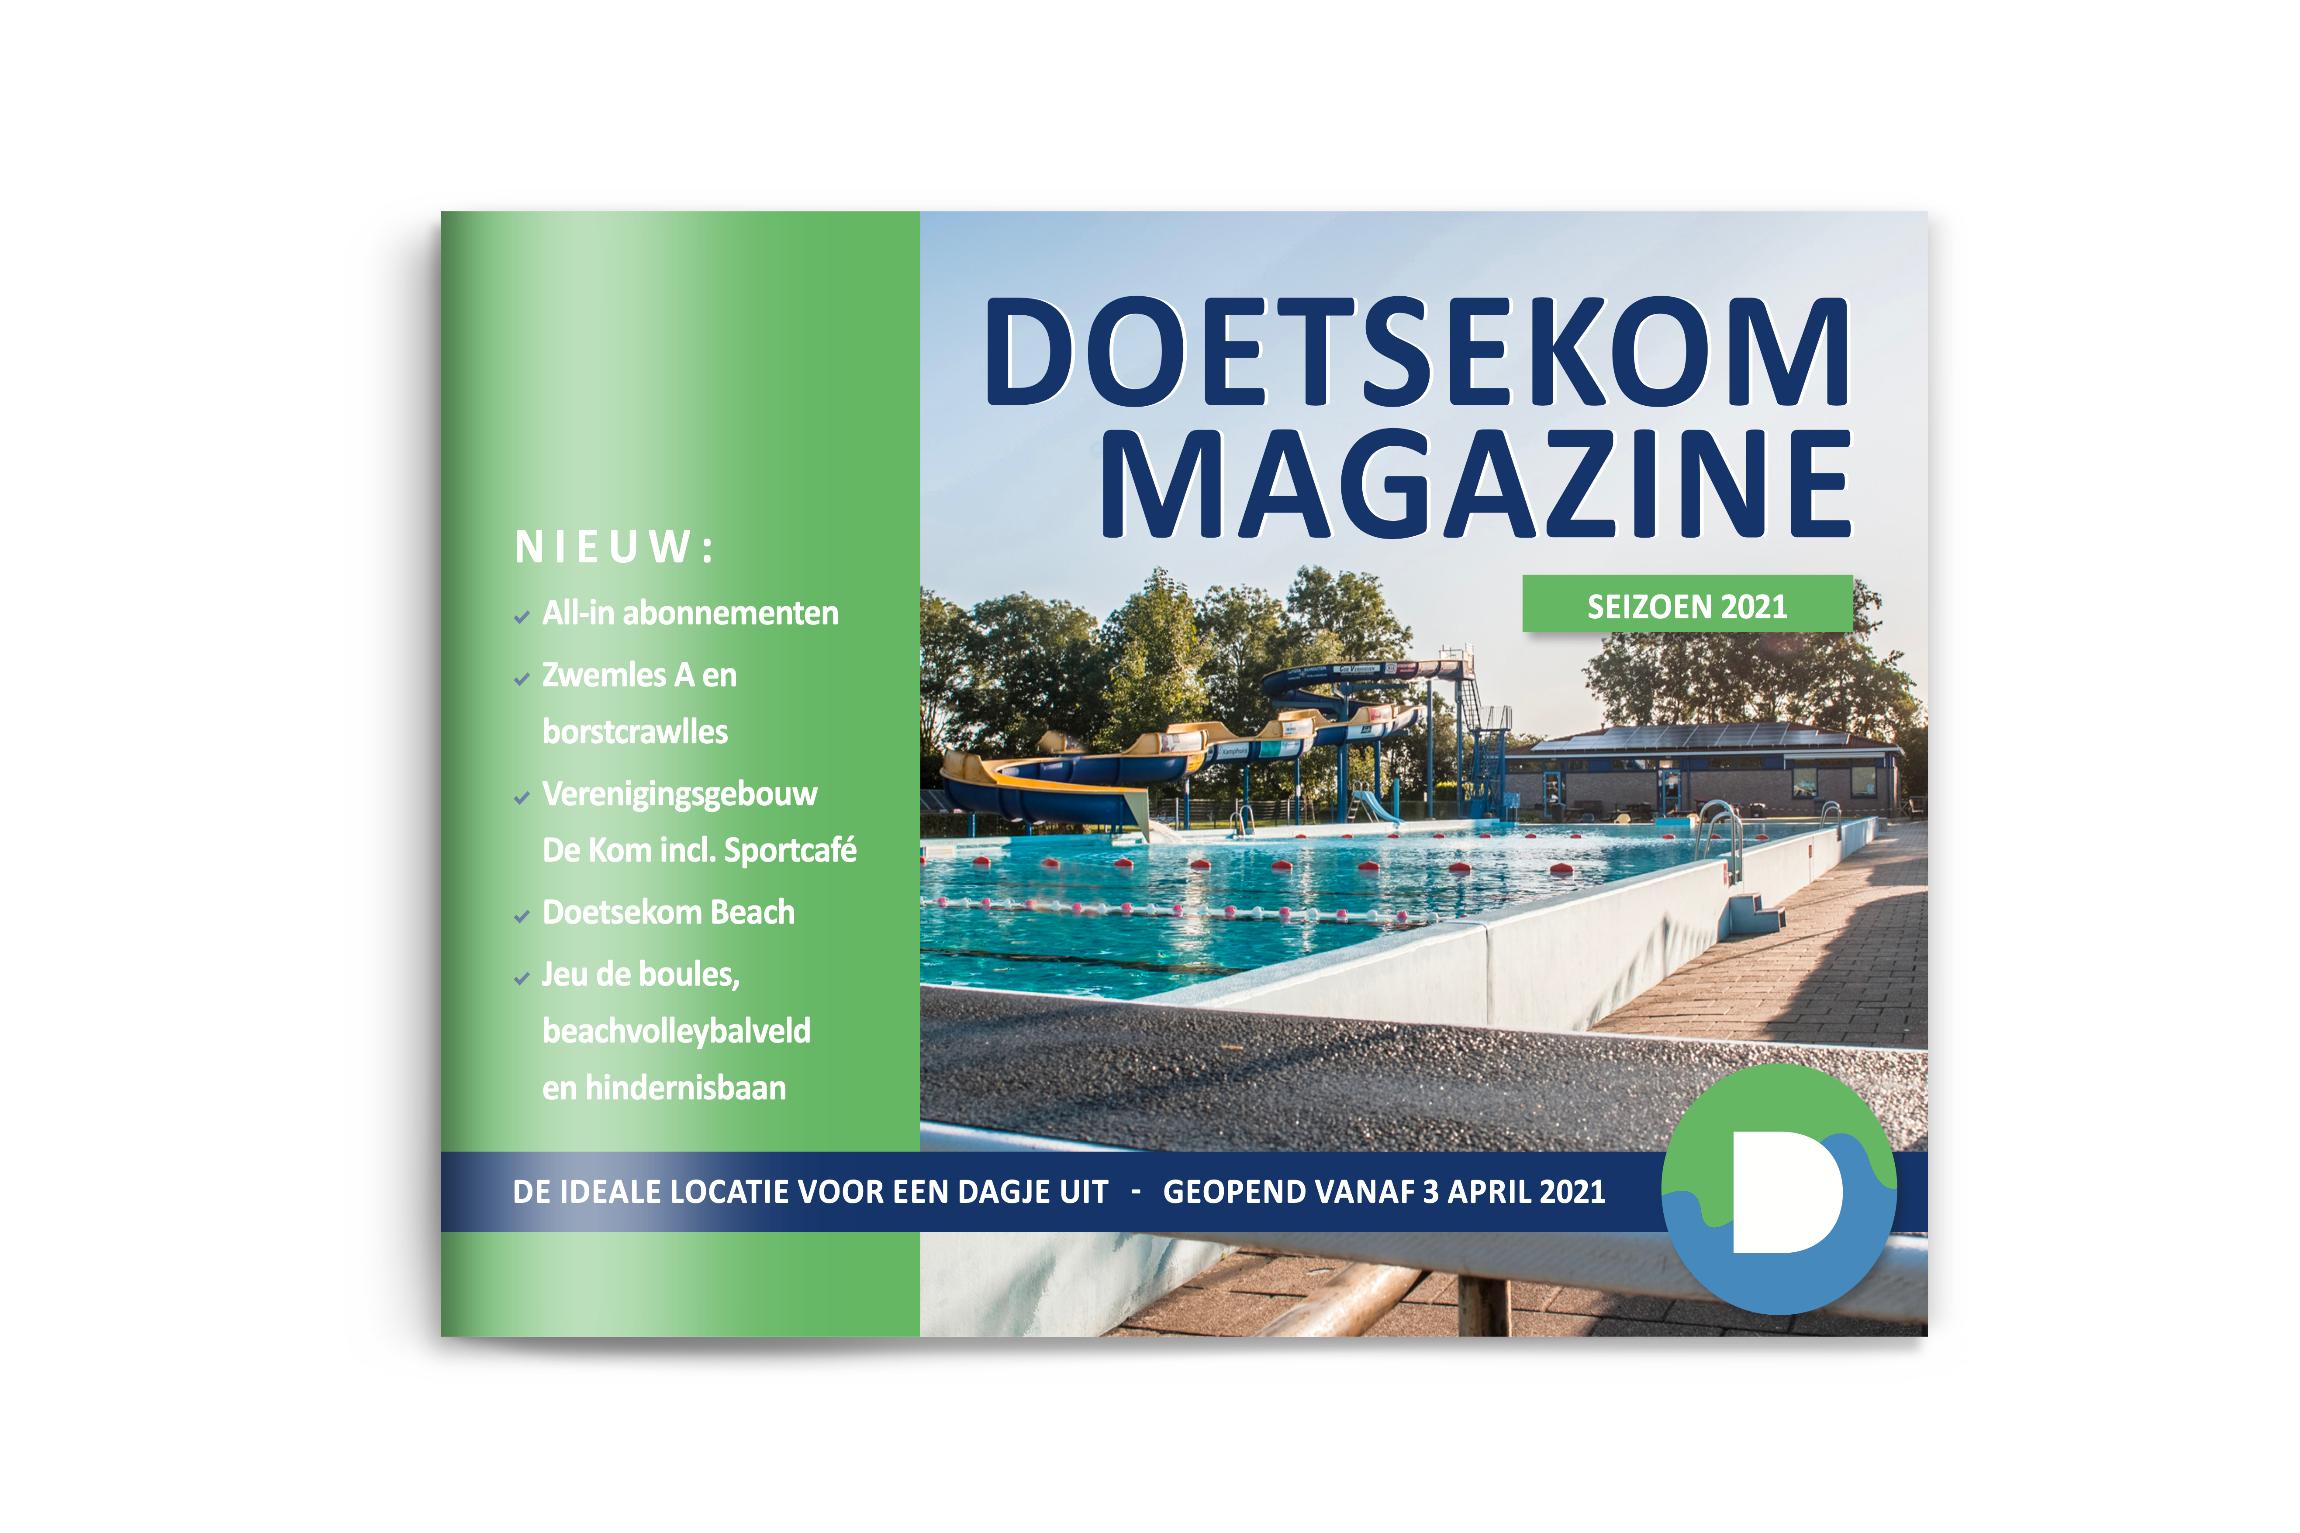 Doetsekom Magazine 2021